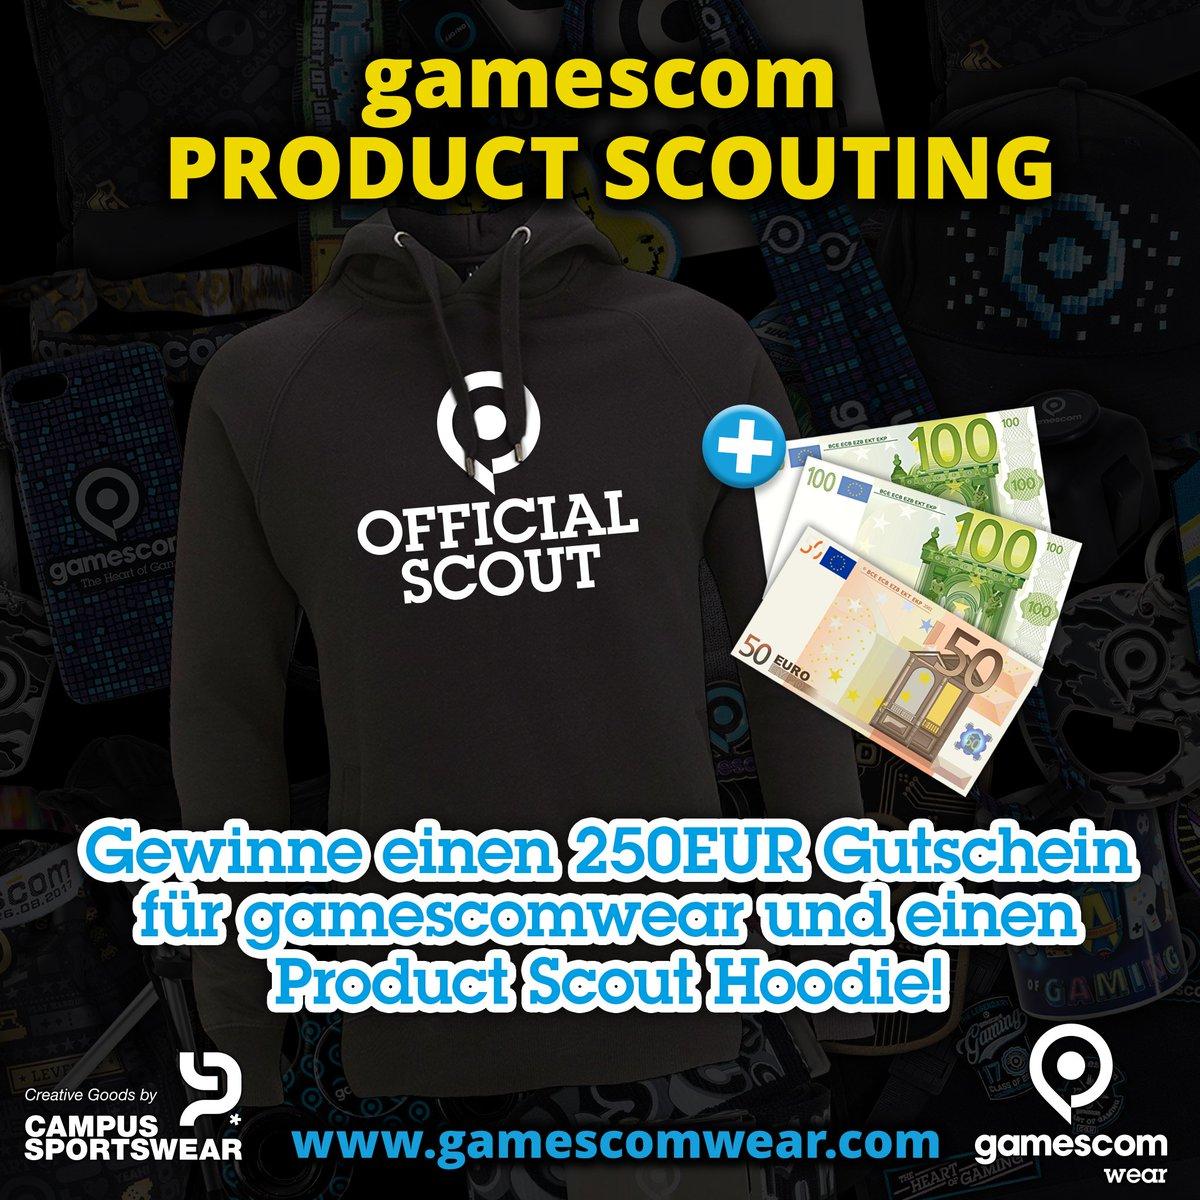 Gamescomwear Hashtag On Twitter